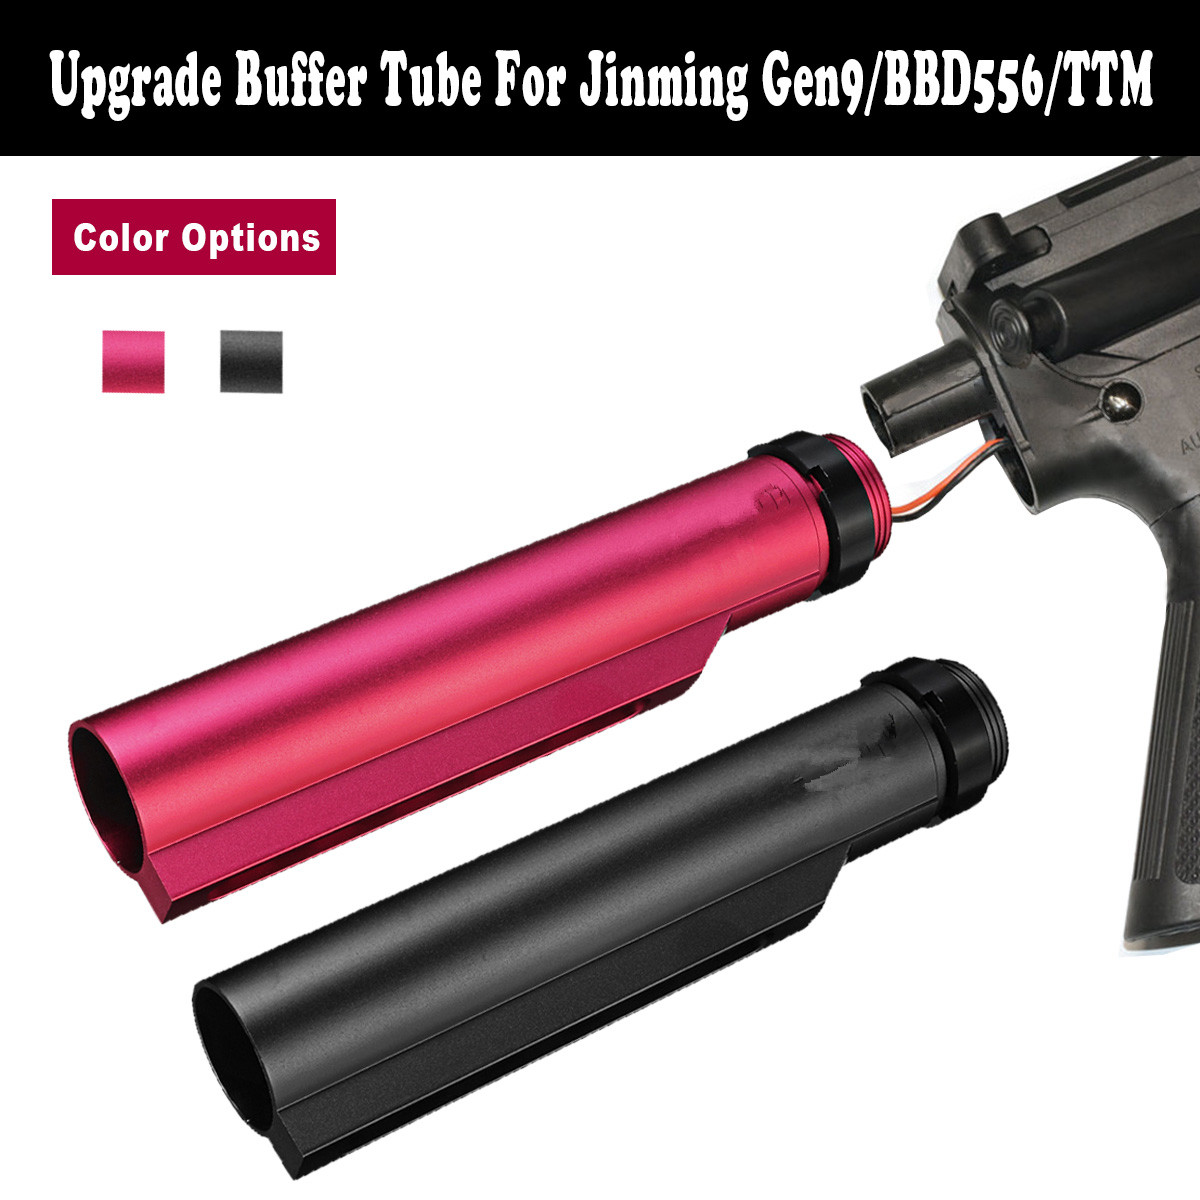 Upgrade Metal Buffer Tube For Jinming Gen9/BBD556/TTM  Water Gel Ball Blasters Toy Guns Replacement Accessories